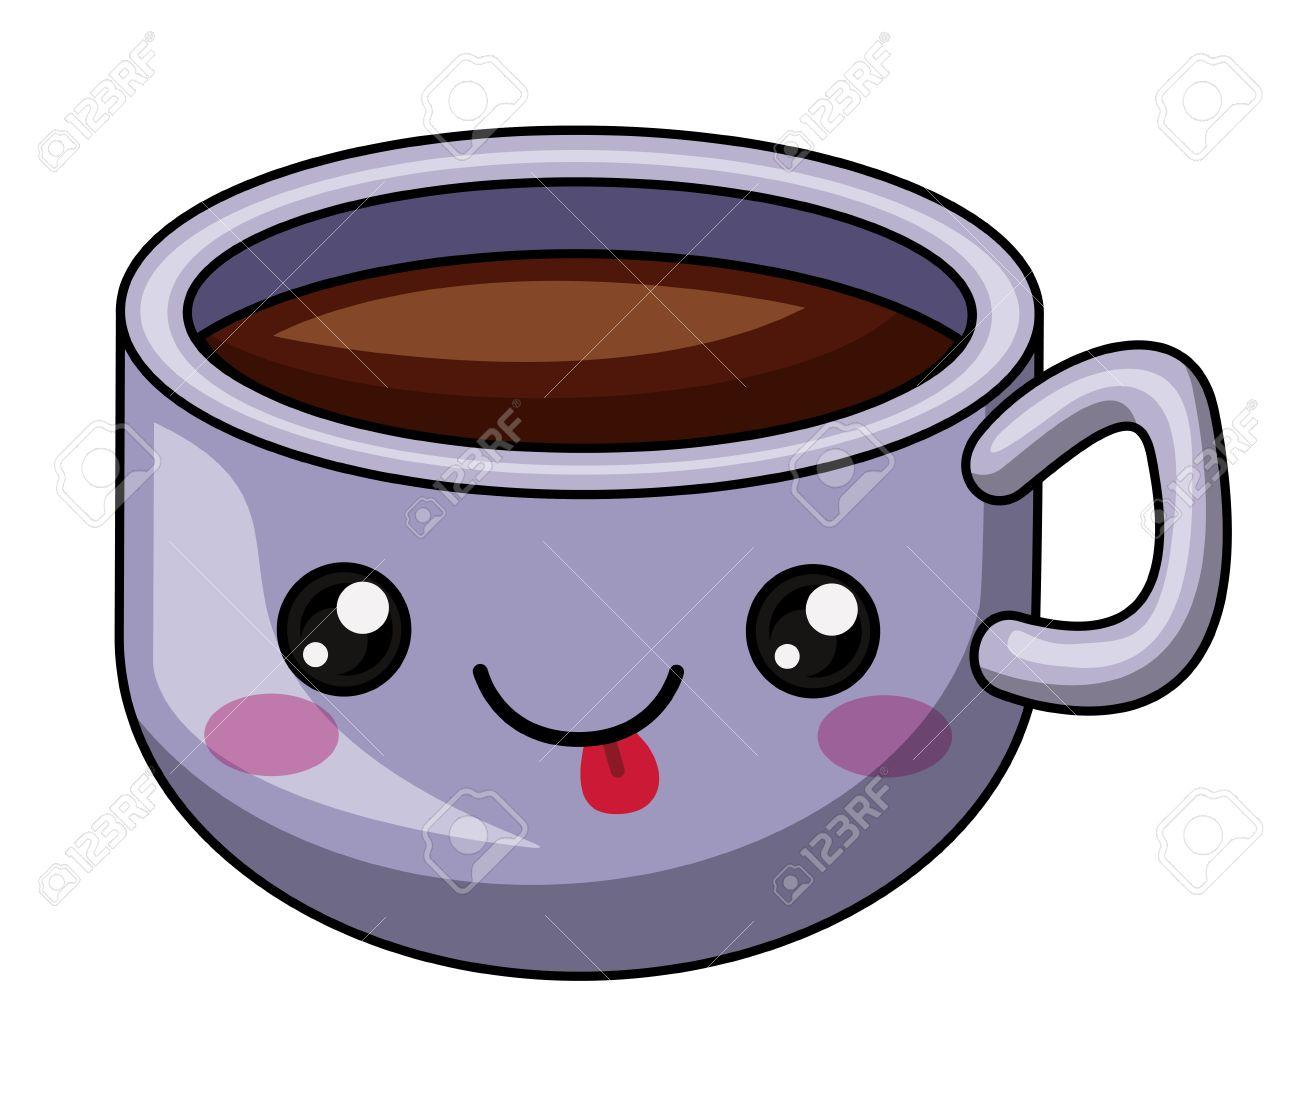 Dazzling Character Coffee Mug Kawaii Face Cartoon Kawaii Face Cartoon Character Personalized Cartoon Coffee Mugs Cartoon Network Coffee Mug Coffee Mug furniture Cartoon Coffee Mug